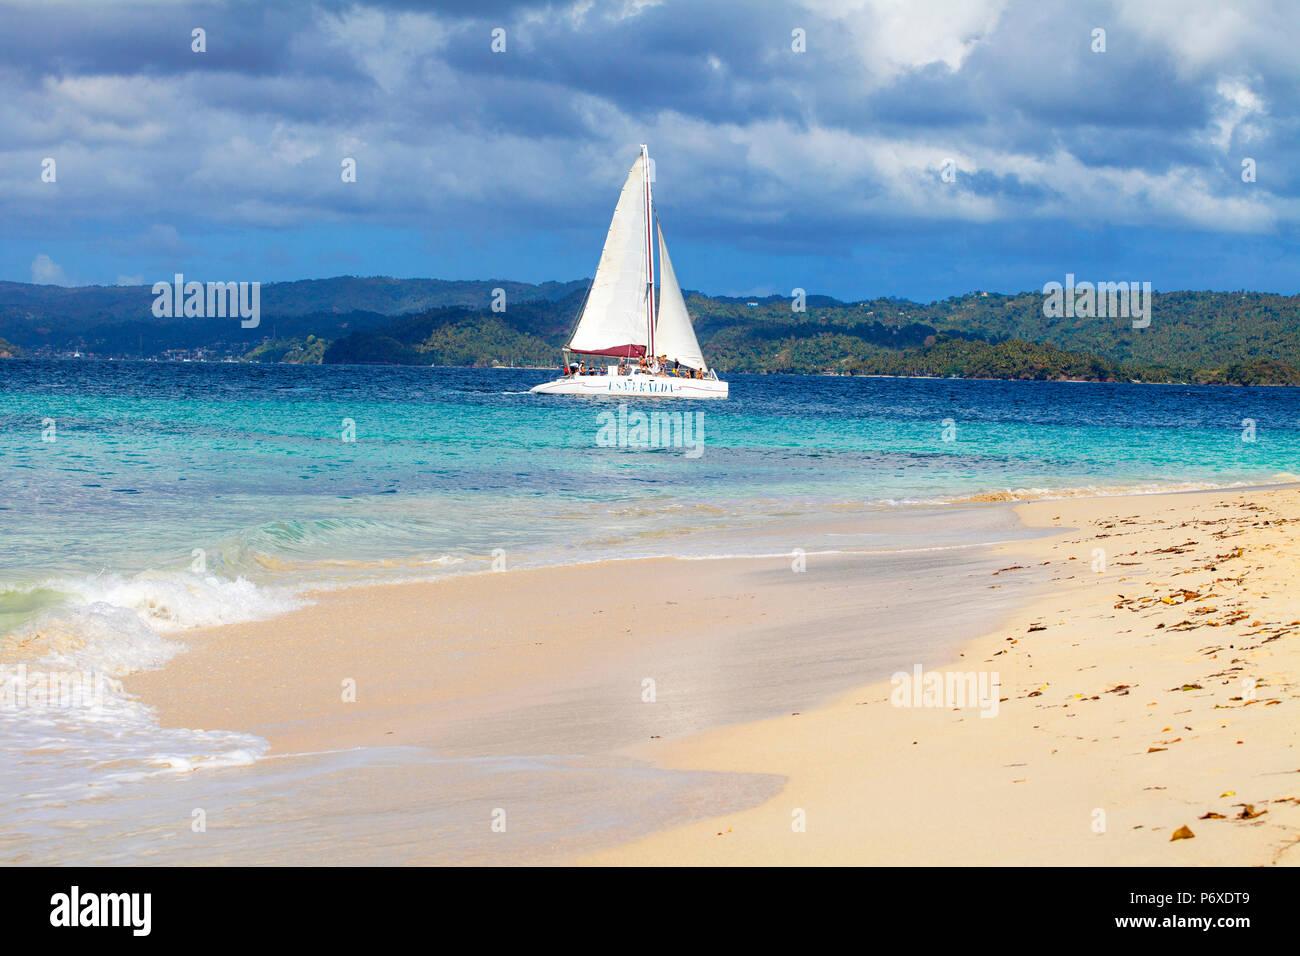 Dominican Republic, Eastern Peninsula De Samana, Samana, Sailboat near Cayo Levantado know as  Bacardi Island - Stock Image